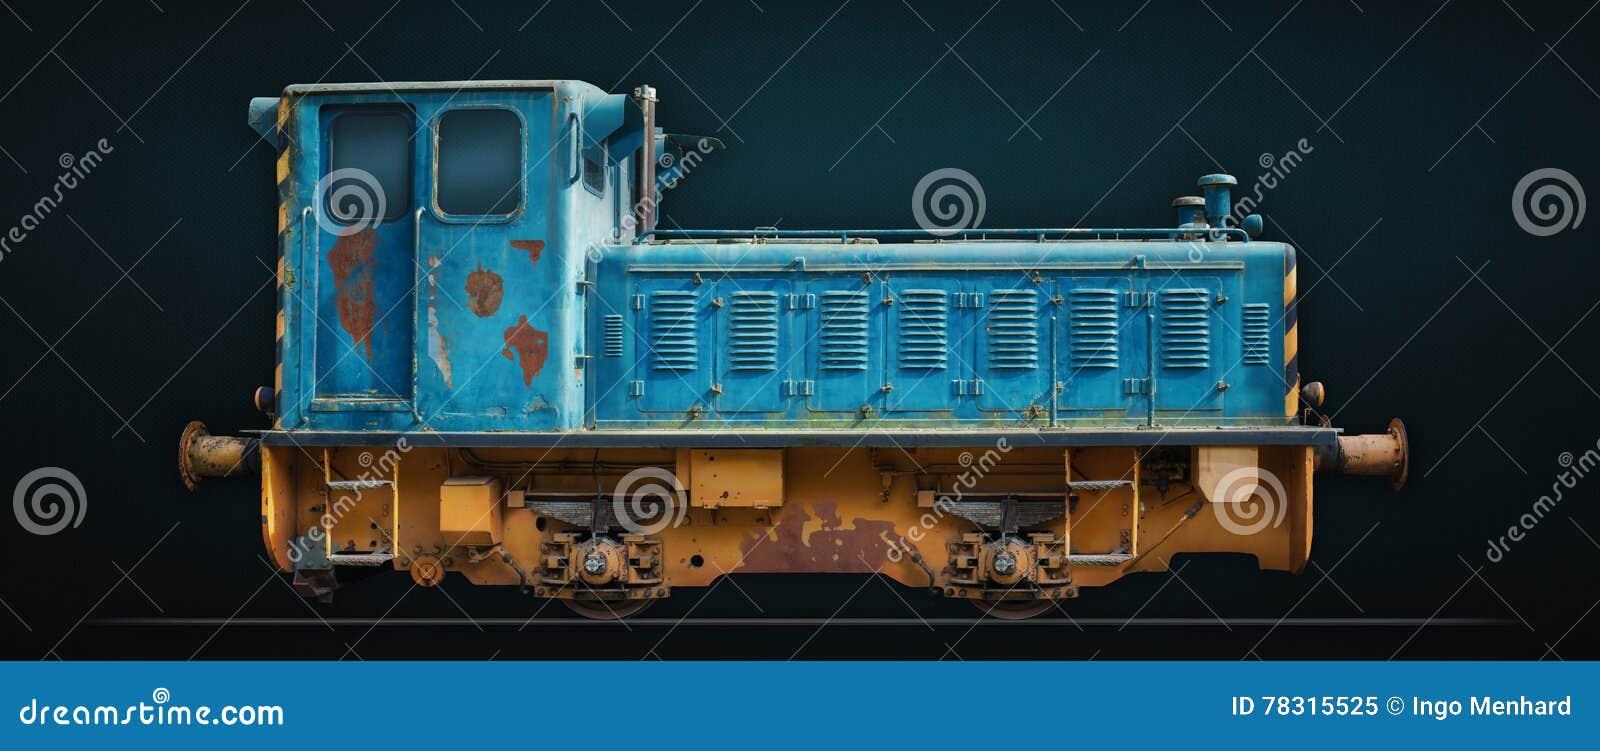 Gruby dama pociąg